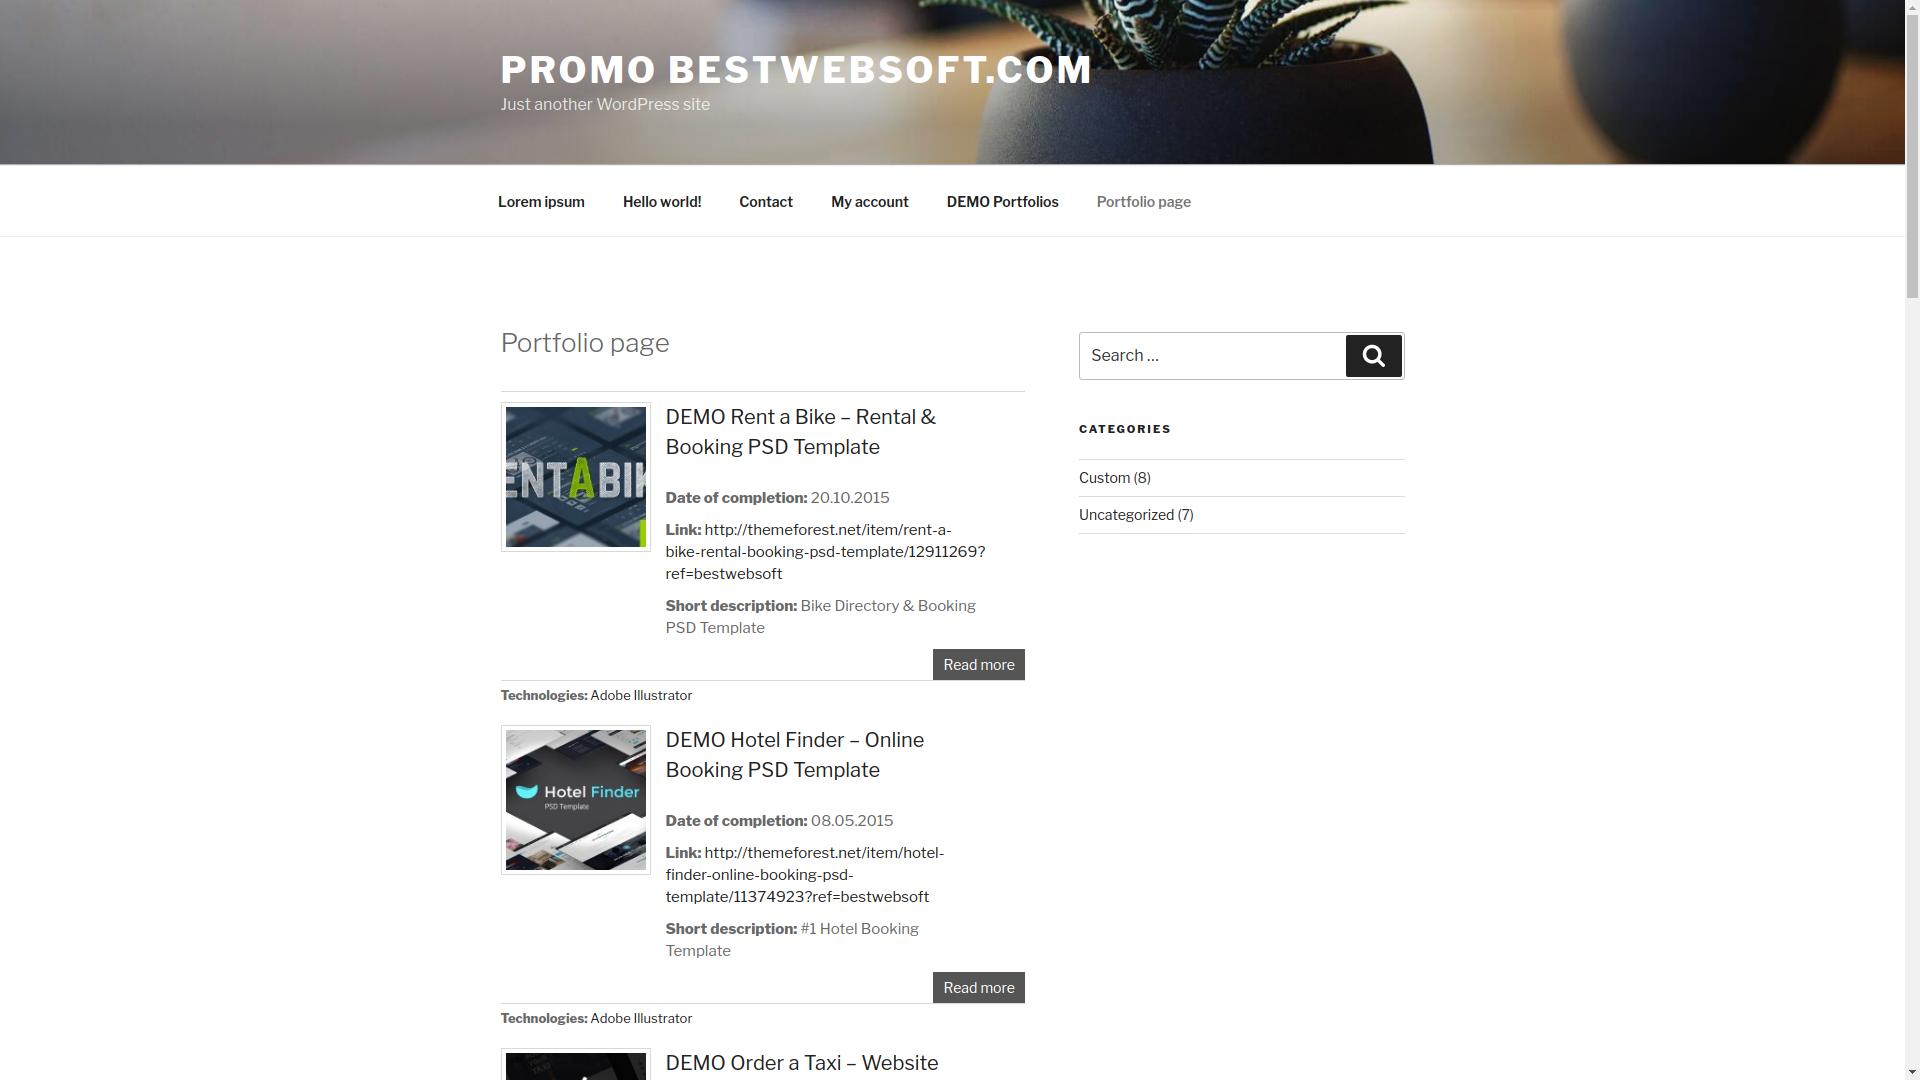 Portfolio frontend page (for all portfolios).